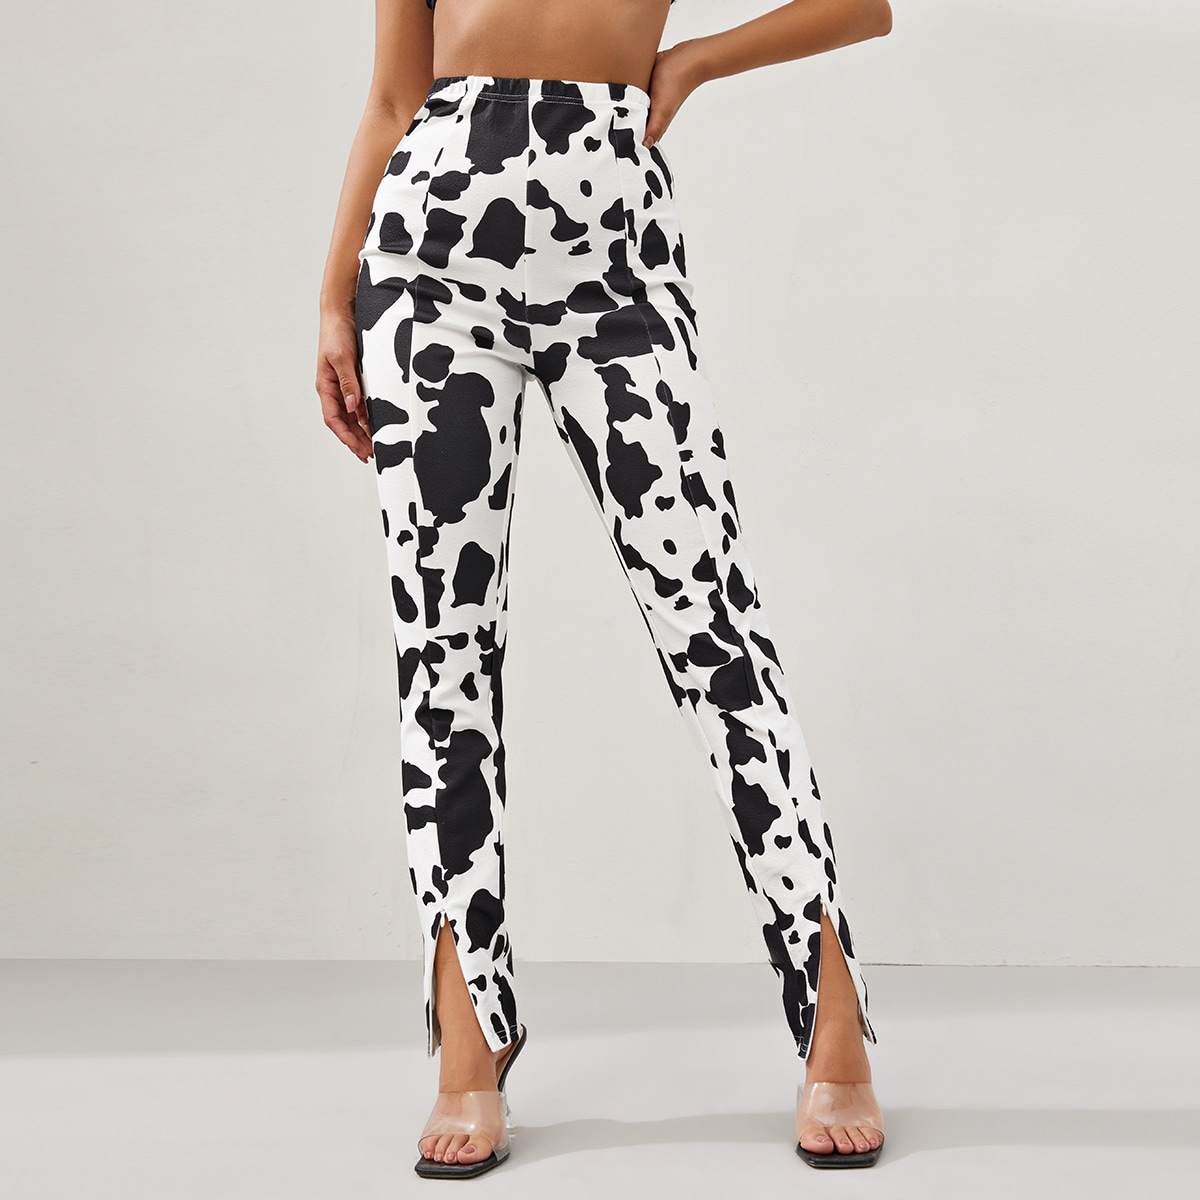 Cow Print Zip Hem Pants, SHEIN  - buy with discount